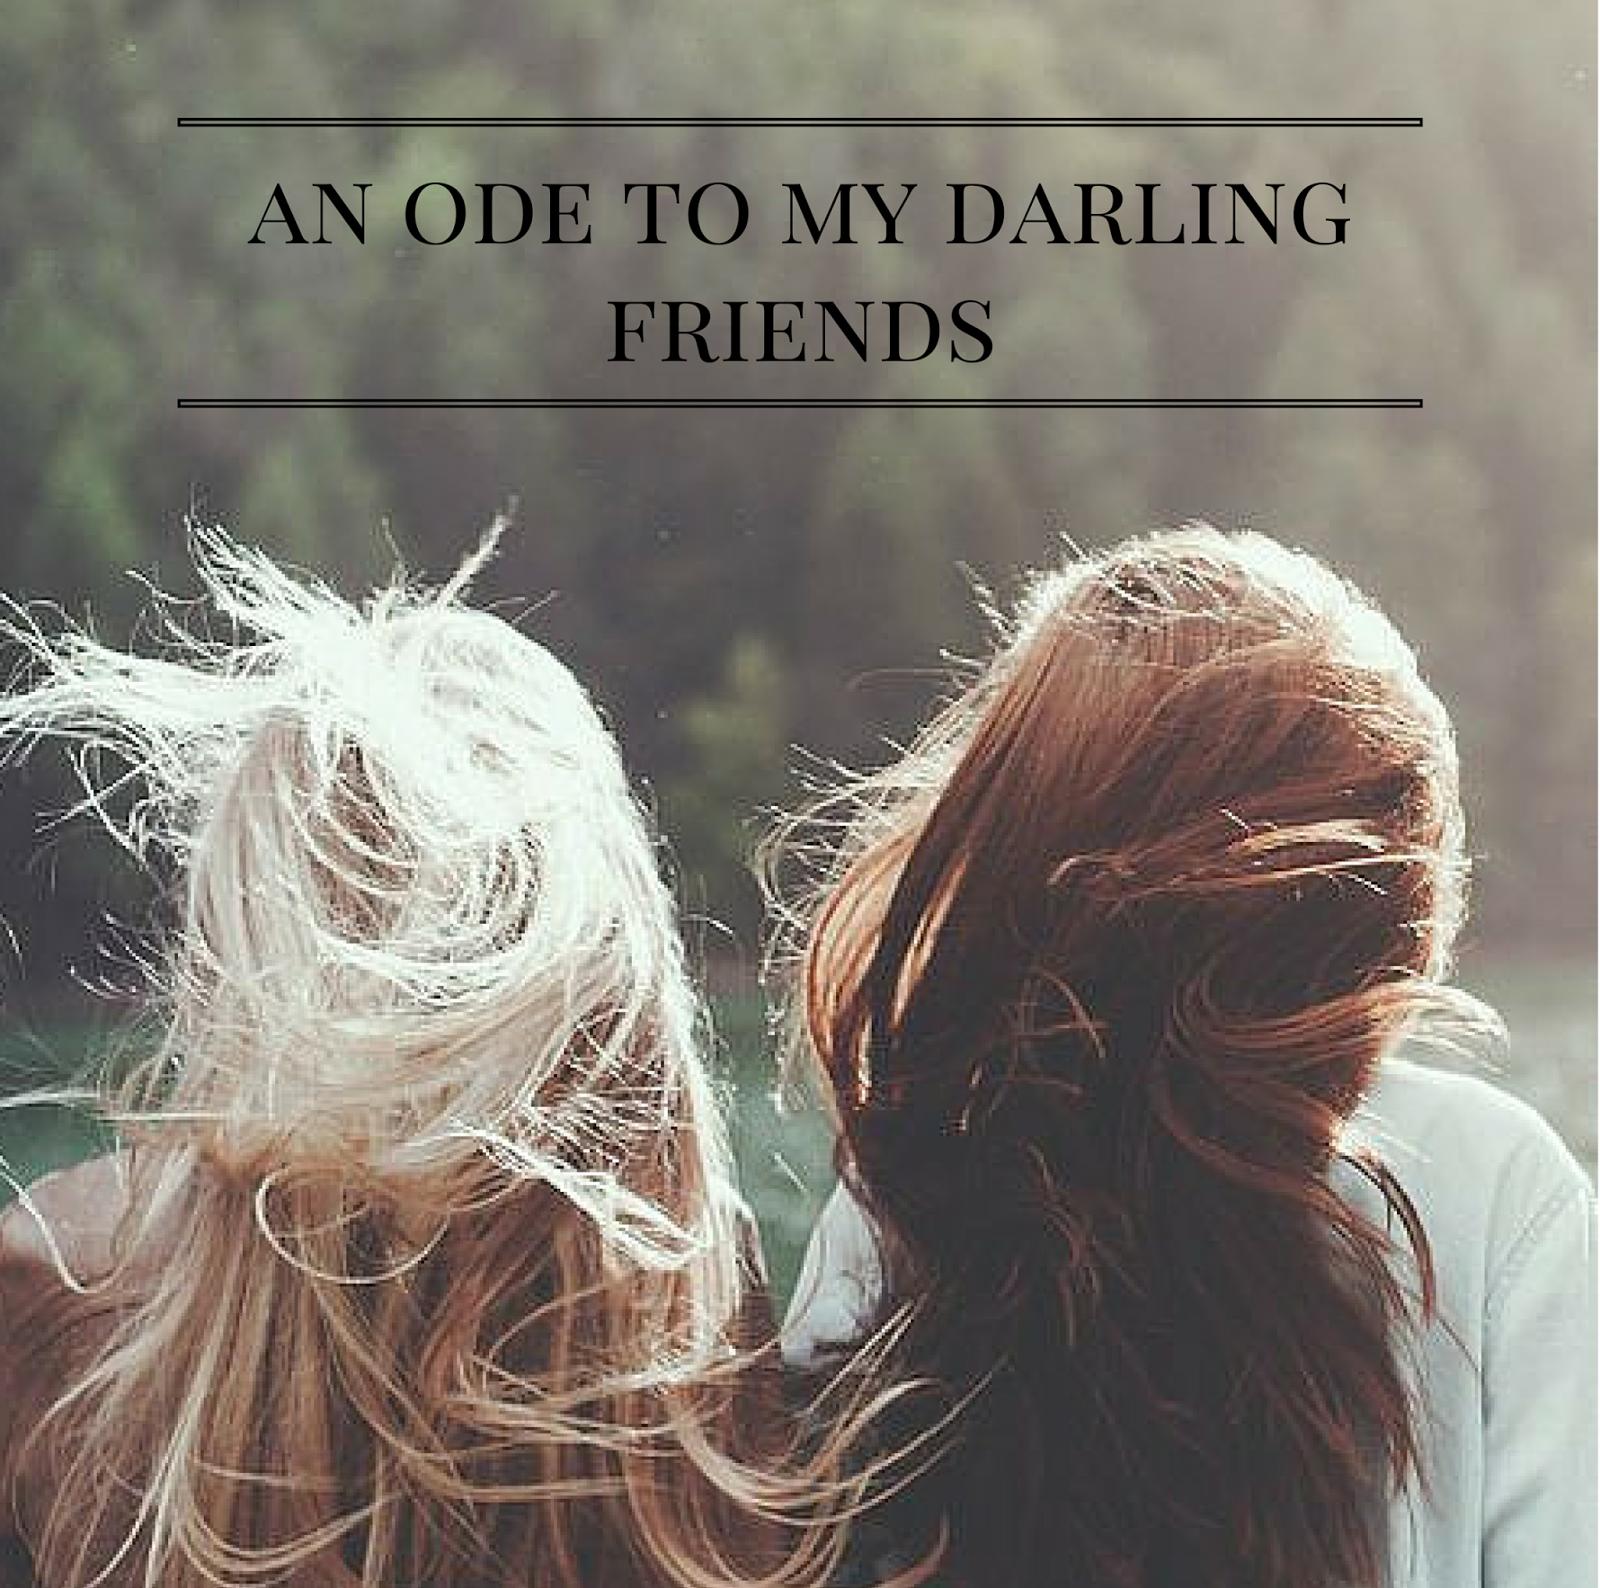 An Ode To My Darling Friends | alyssajfreitas.blogspot.com